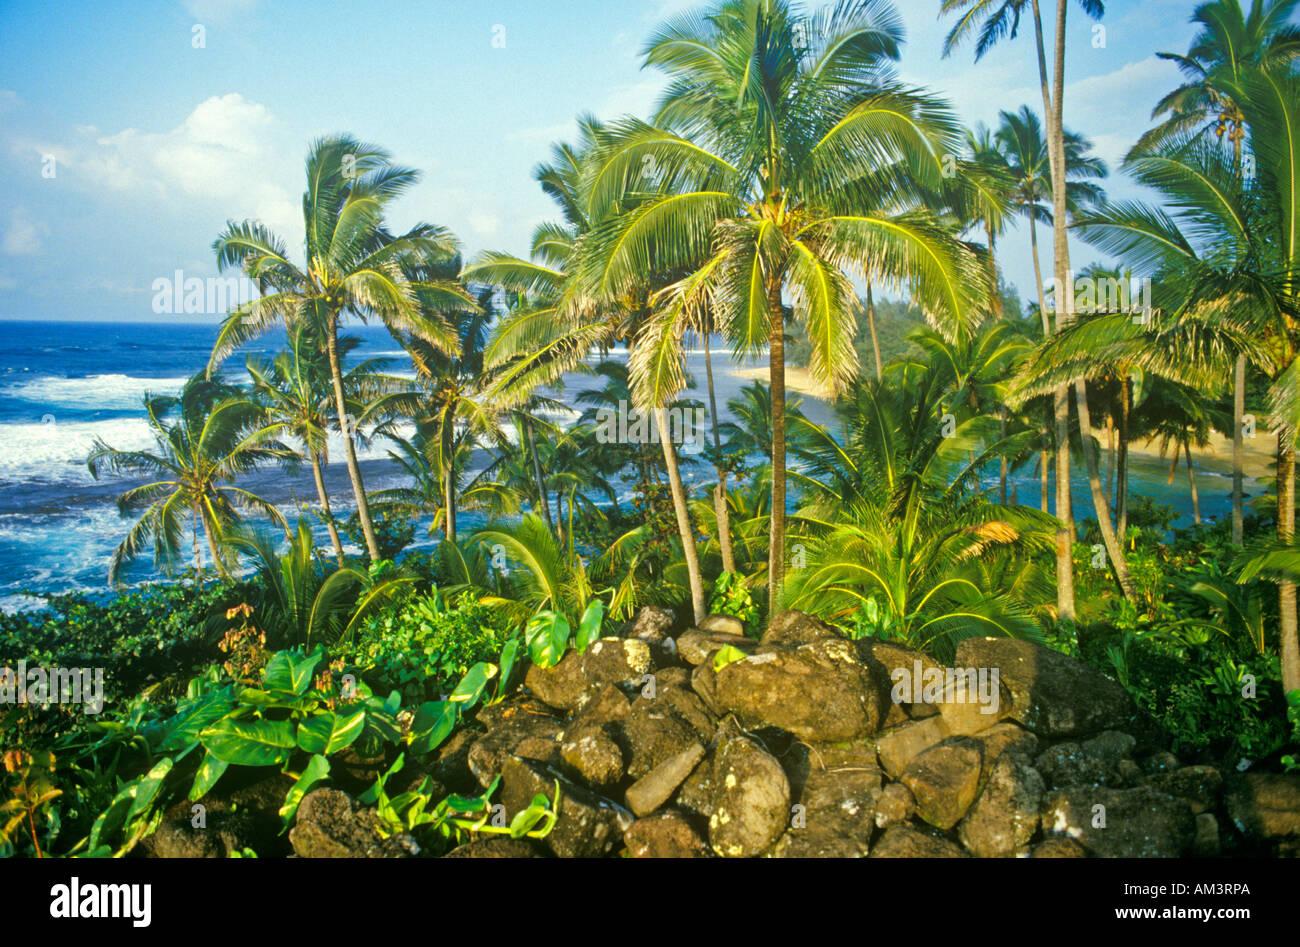 Landscape of road to Hana Maui HI Stock Photo: 8650921 - Alamy